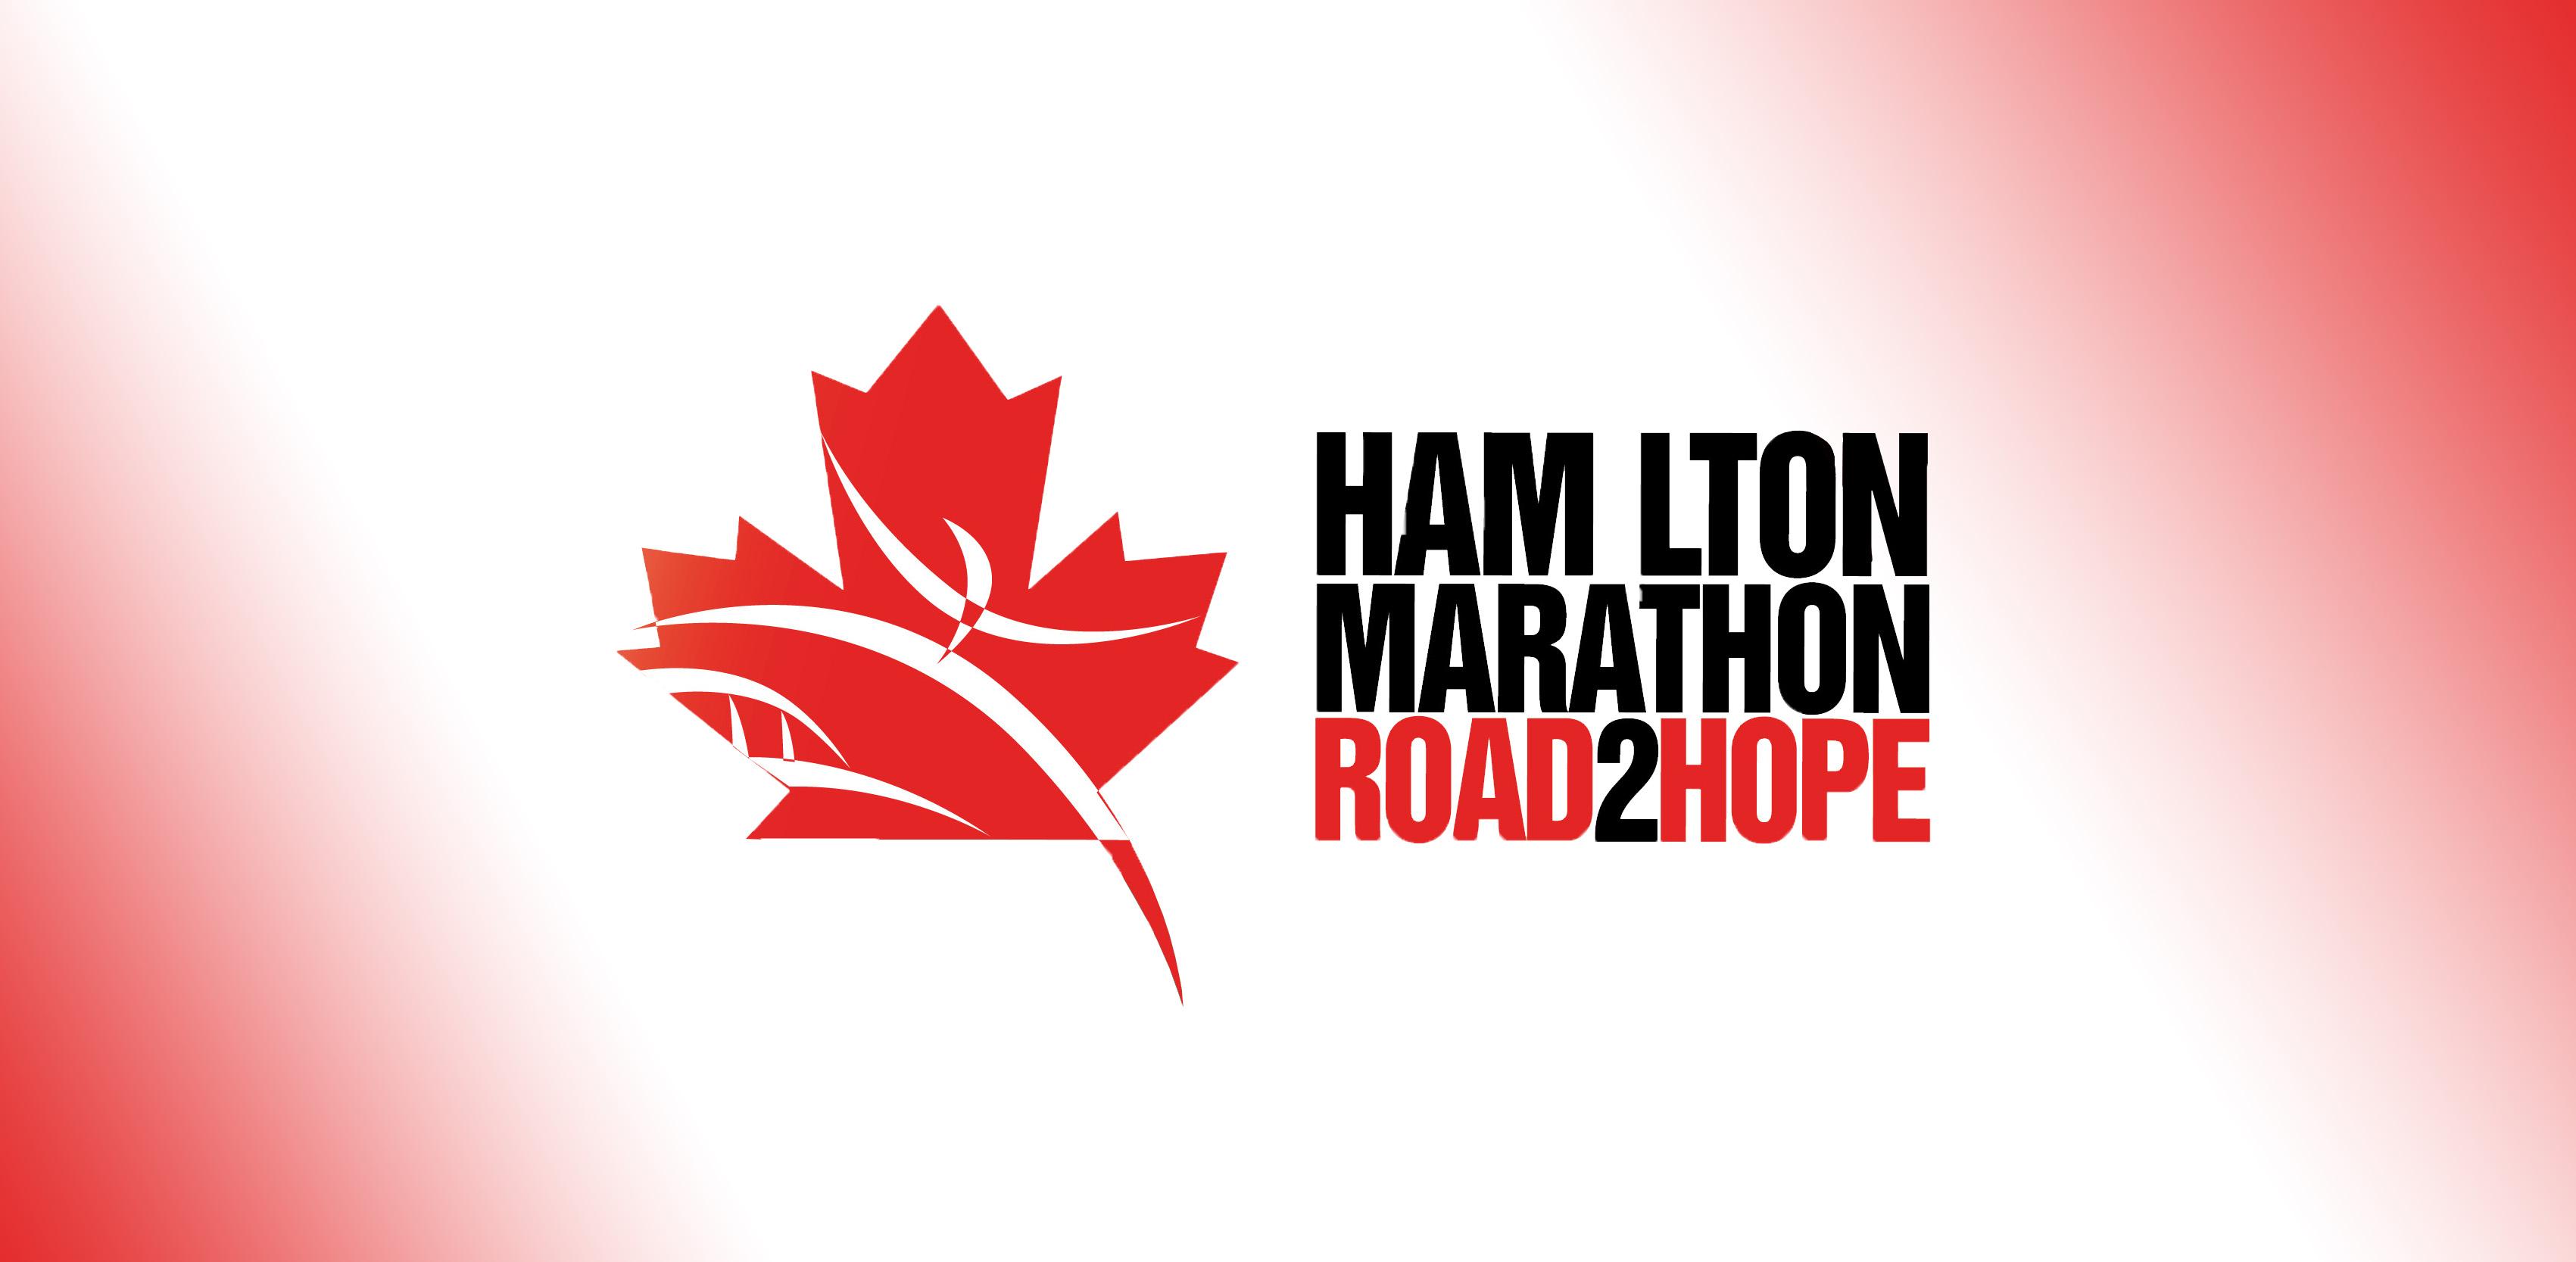 Hamilton Marathon Road2Hope logo